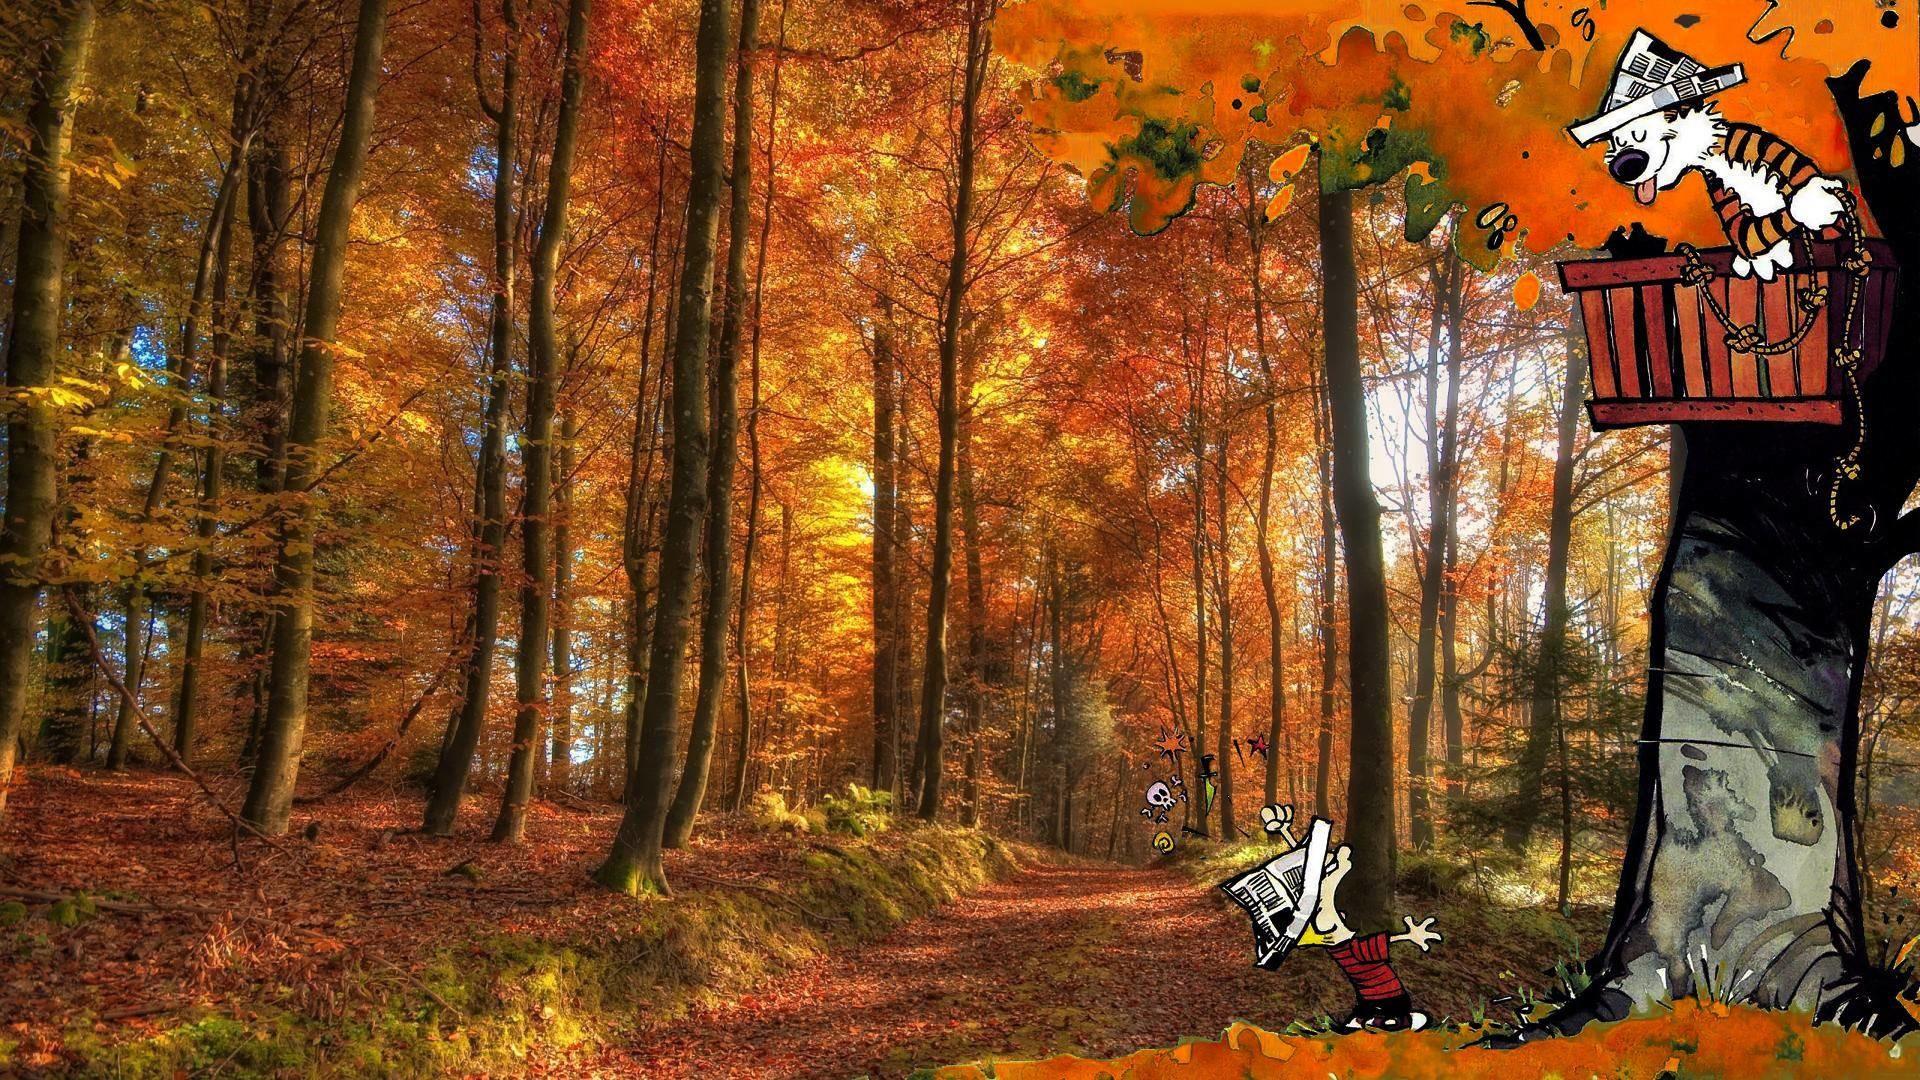 Calvin and hobbes comics autumn forest wallpaper